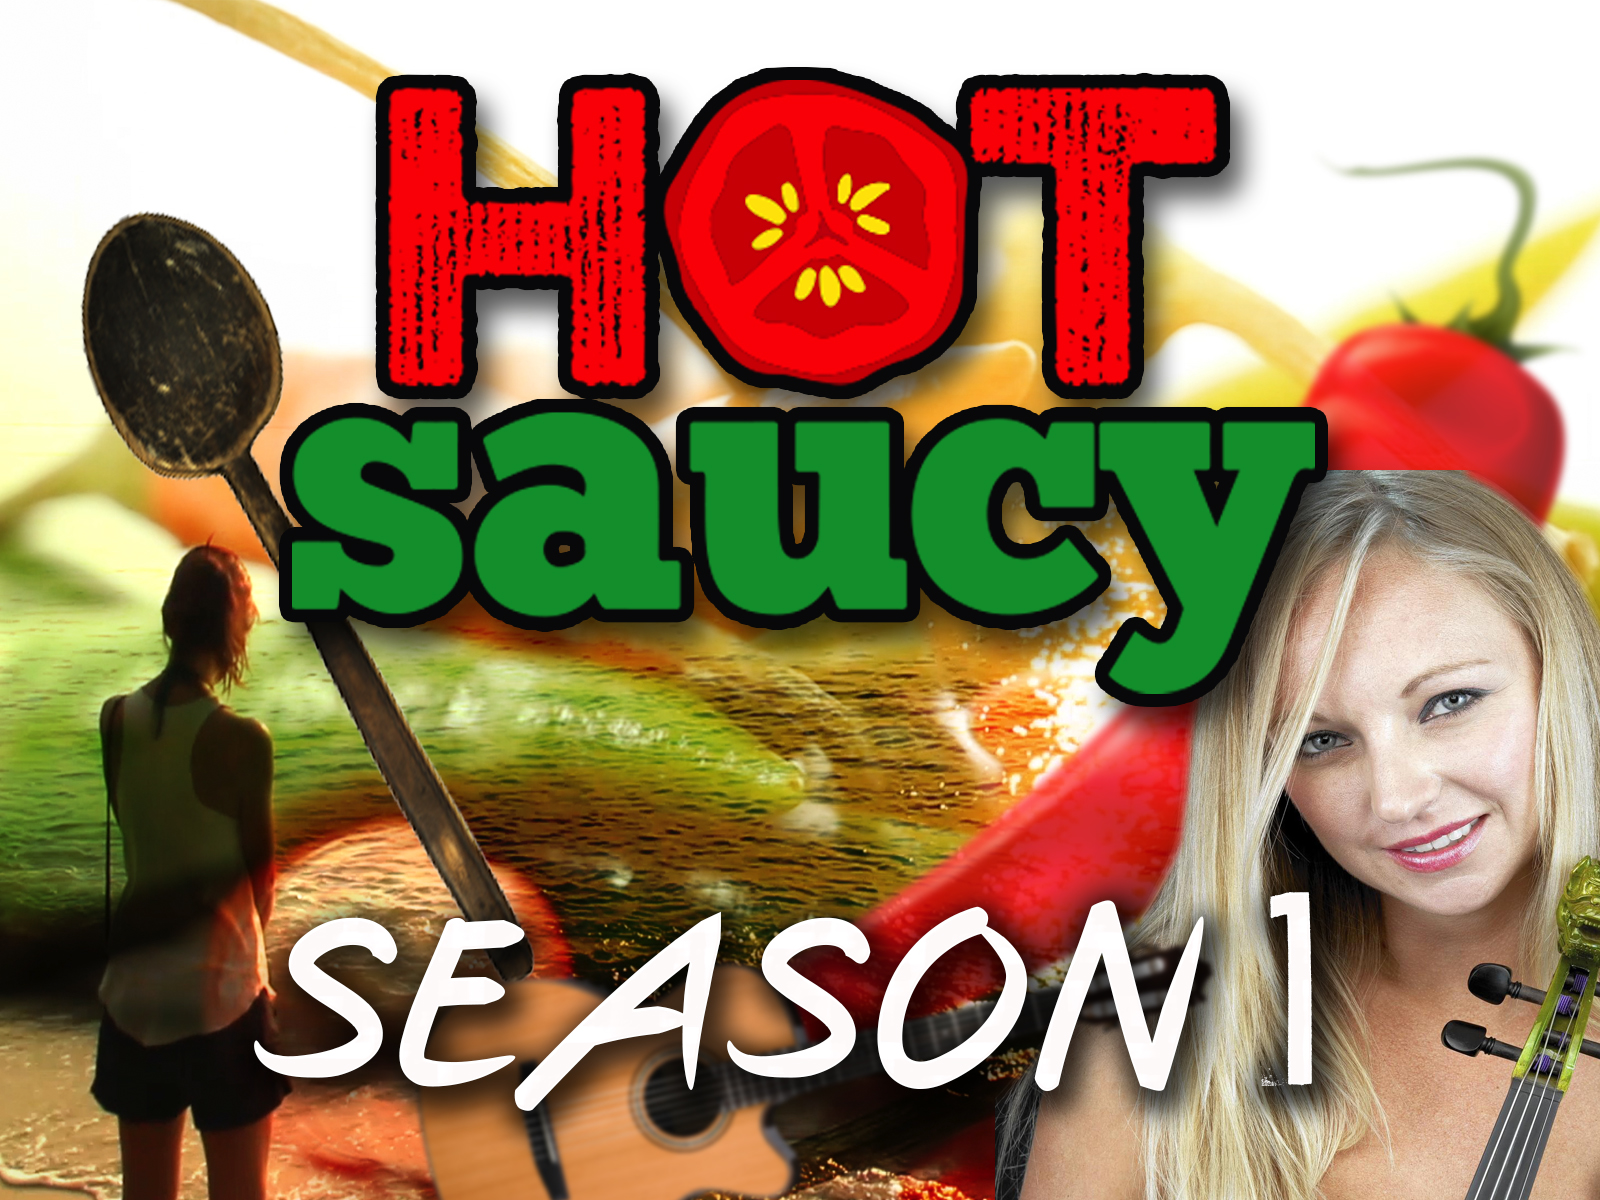 Hot Saucy Season 1